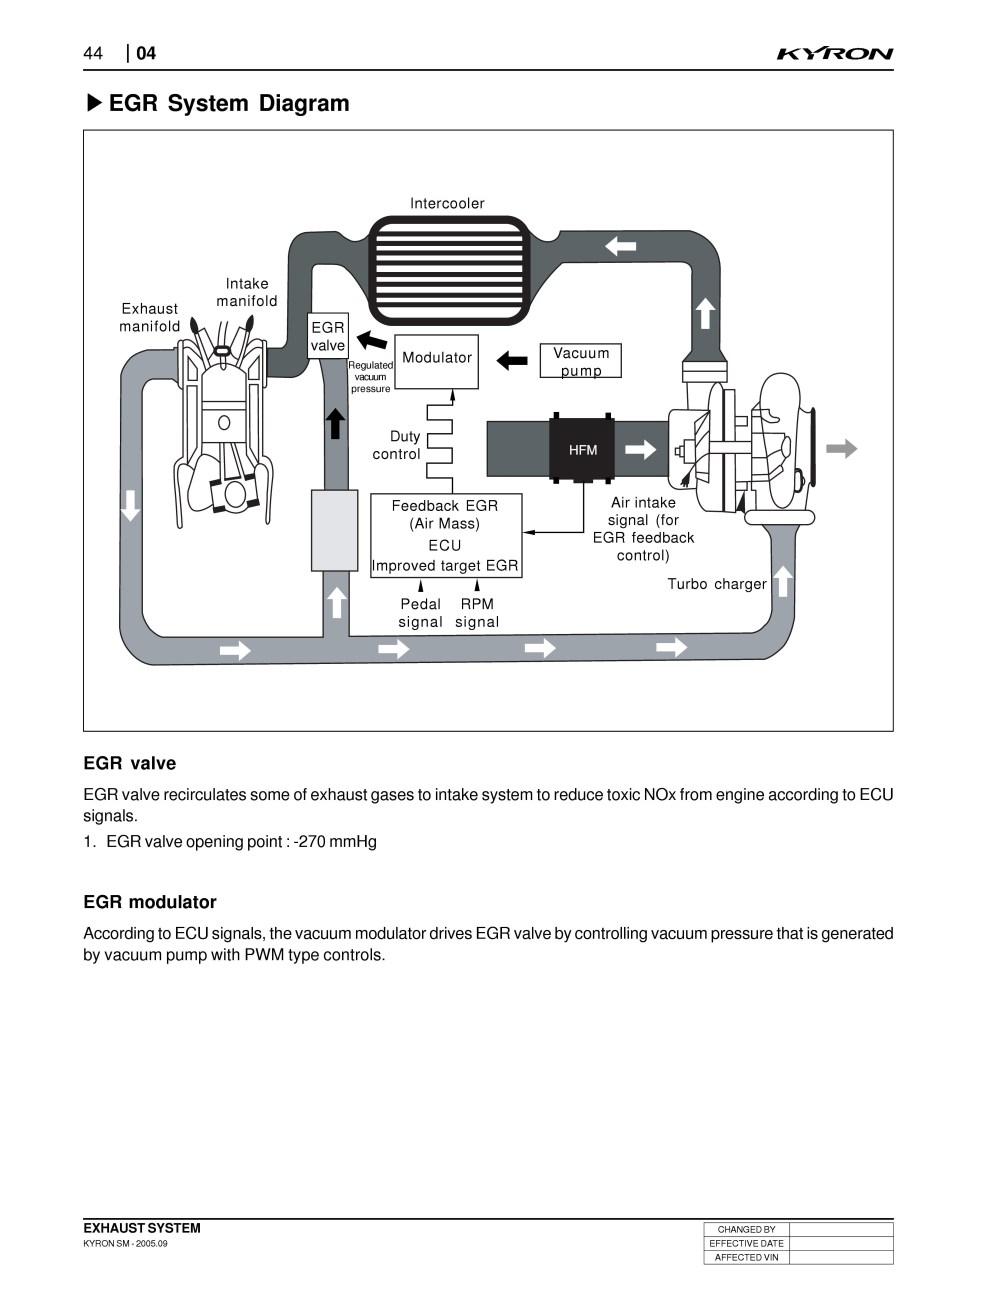 medium resolution of ford escape egr valve diagram explained wiring diagrams 1984 ford egr diagram ford f 250 super duty wiring diagram